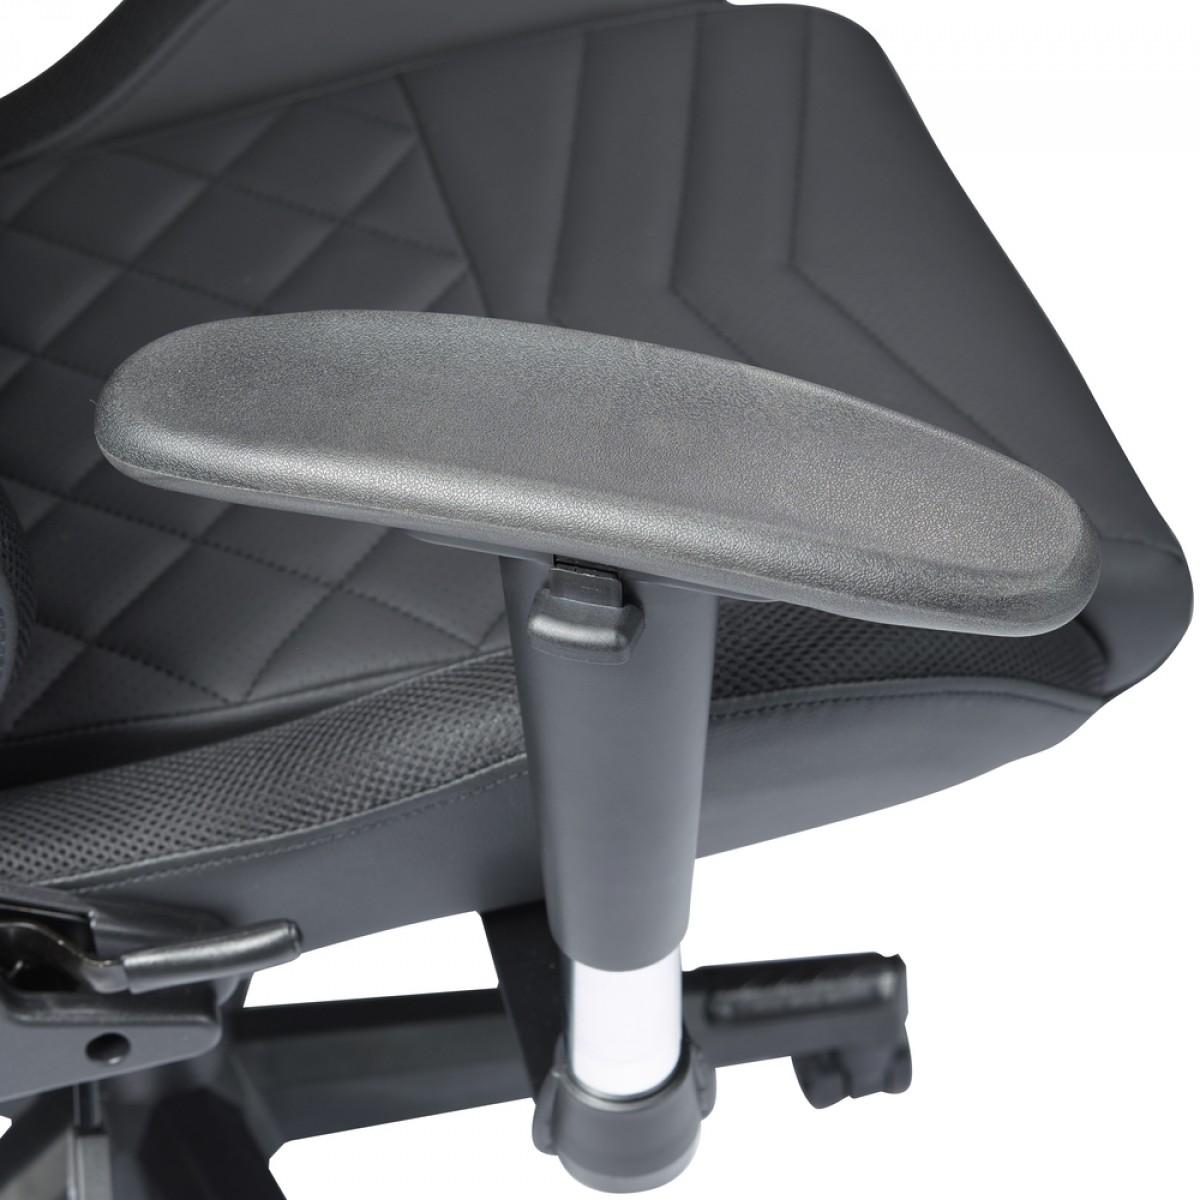 Cadeira Gamer Riotoro, Spitfire X1S, RGB, Reclinável, Black, GC-30X1S